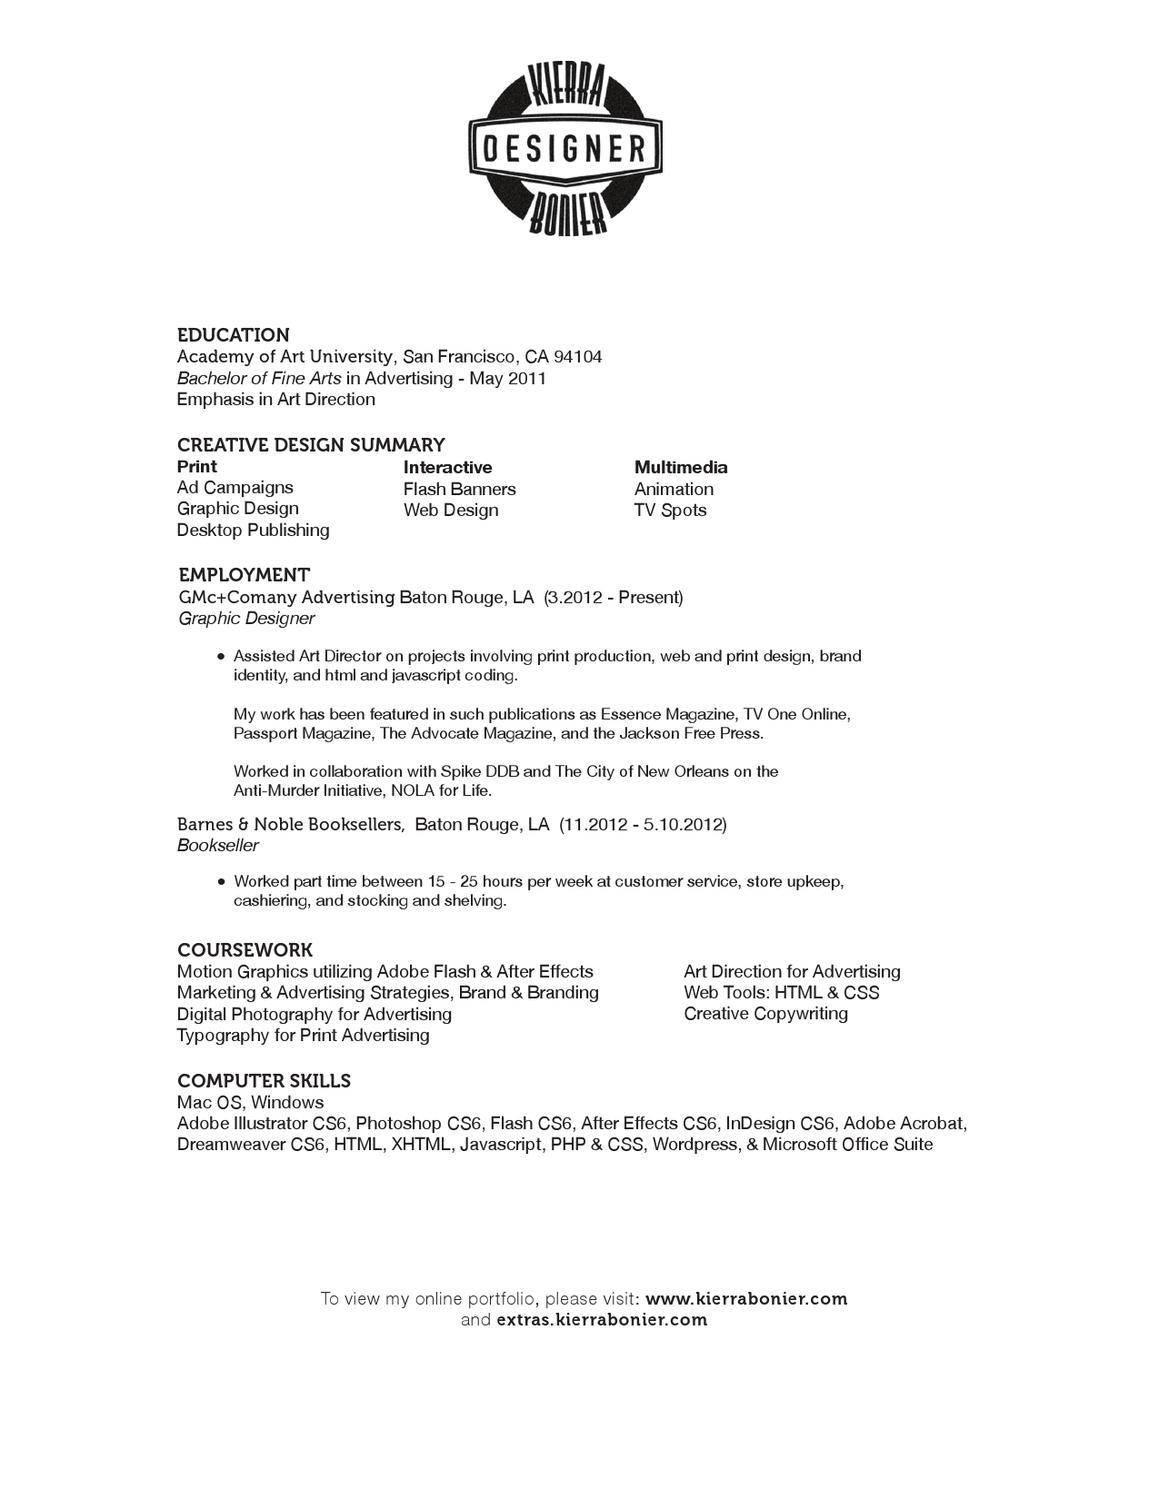 Bonier Resume by Kierra B - issuu